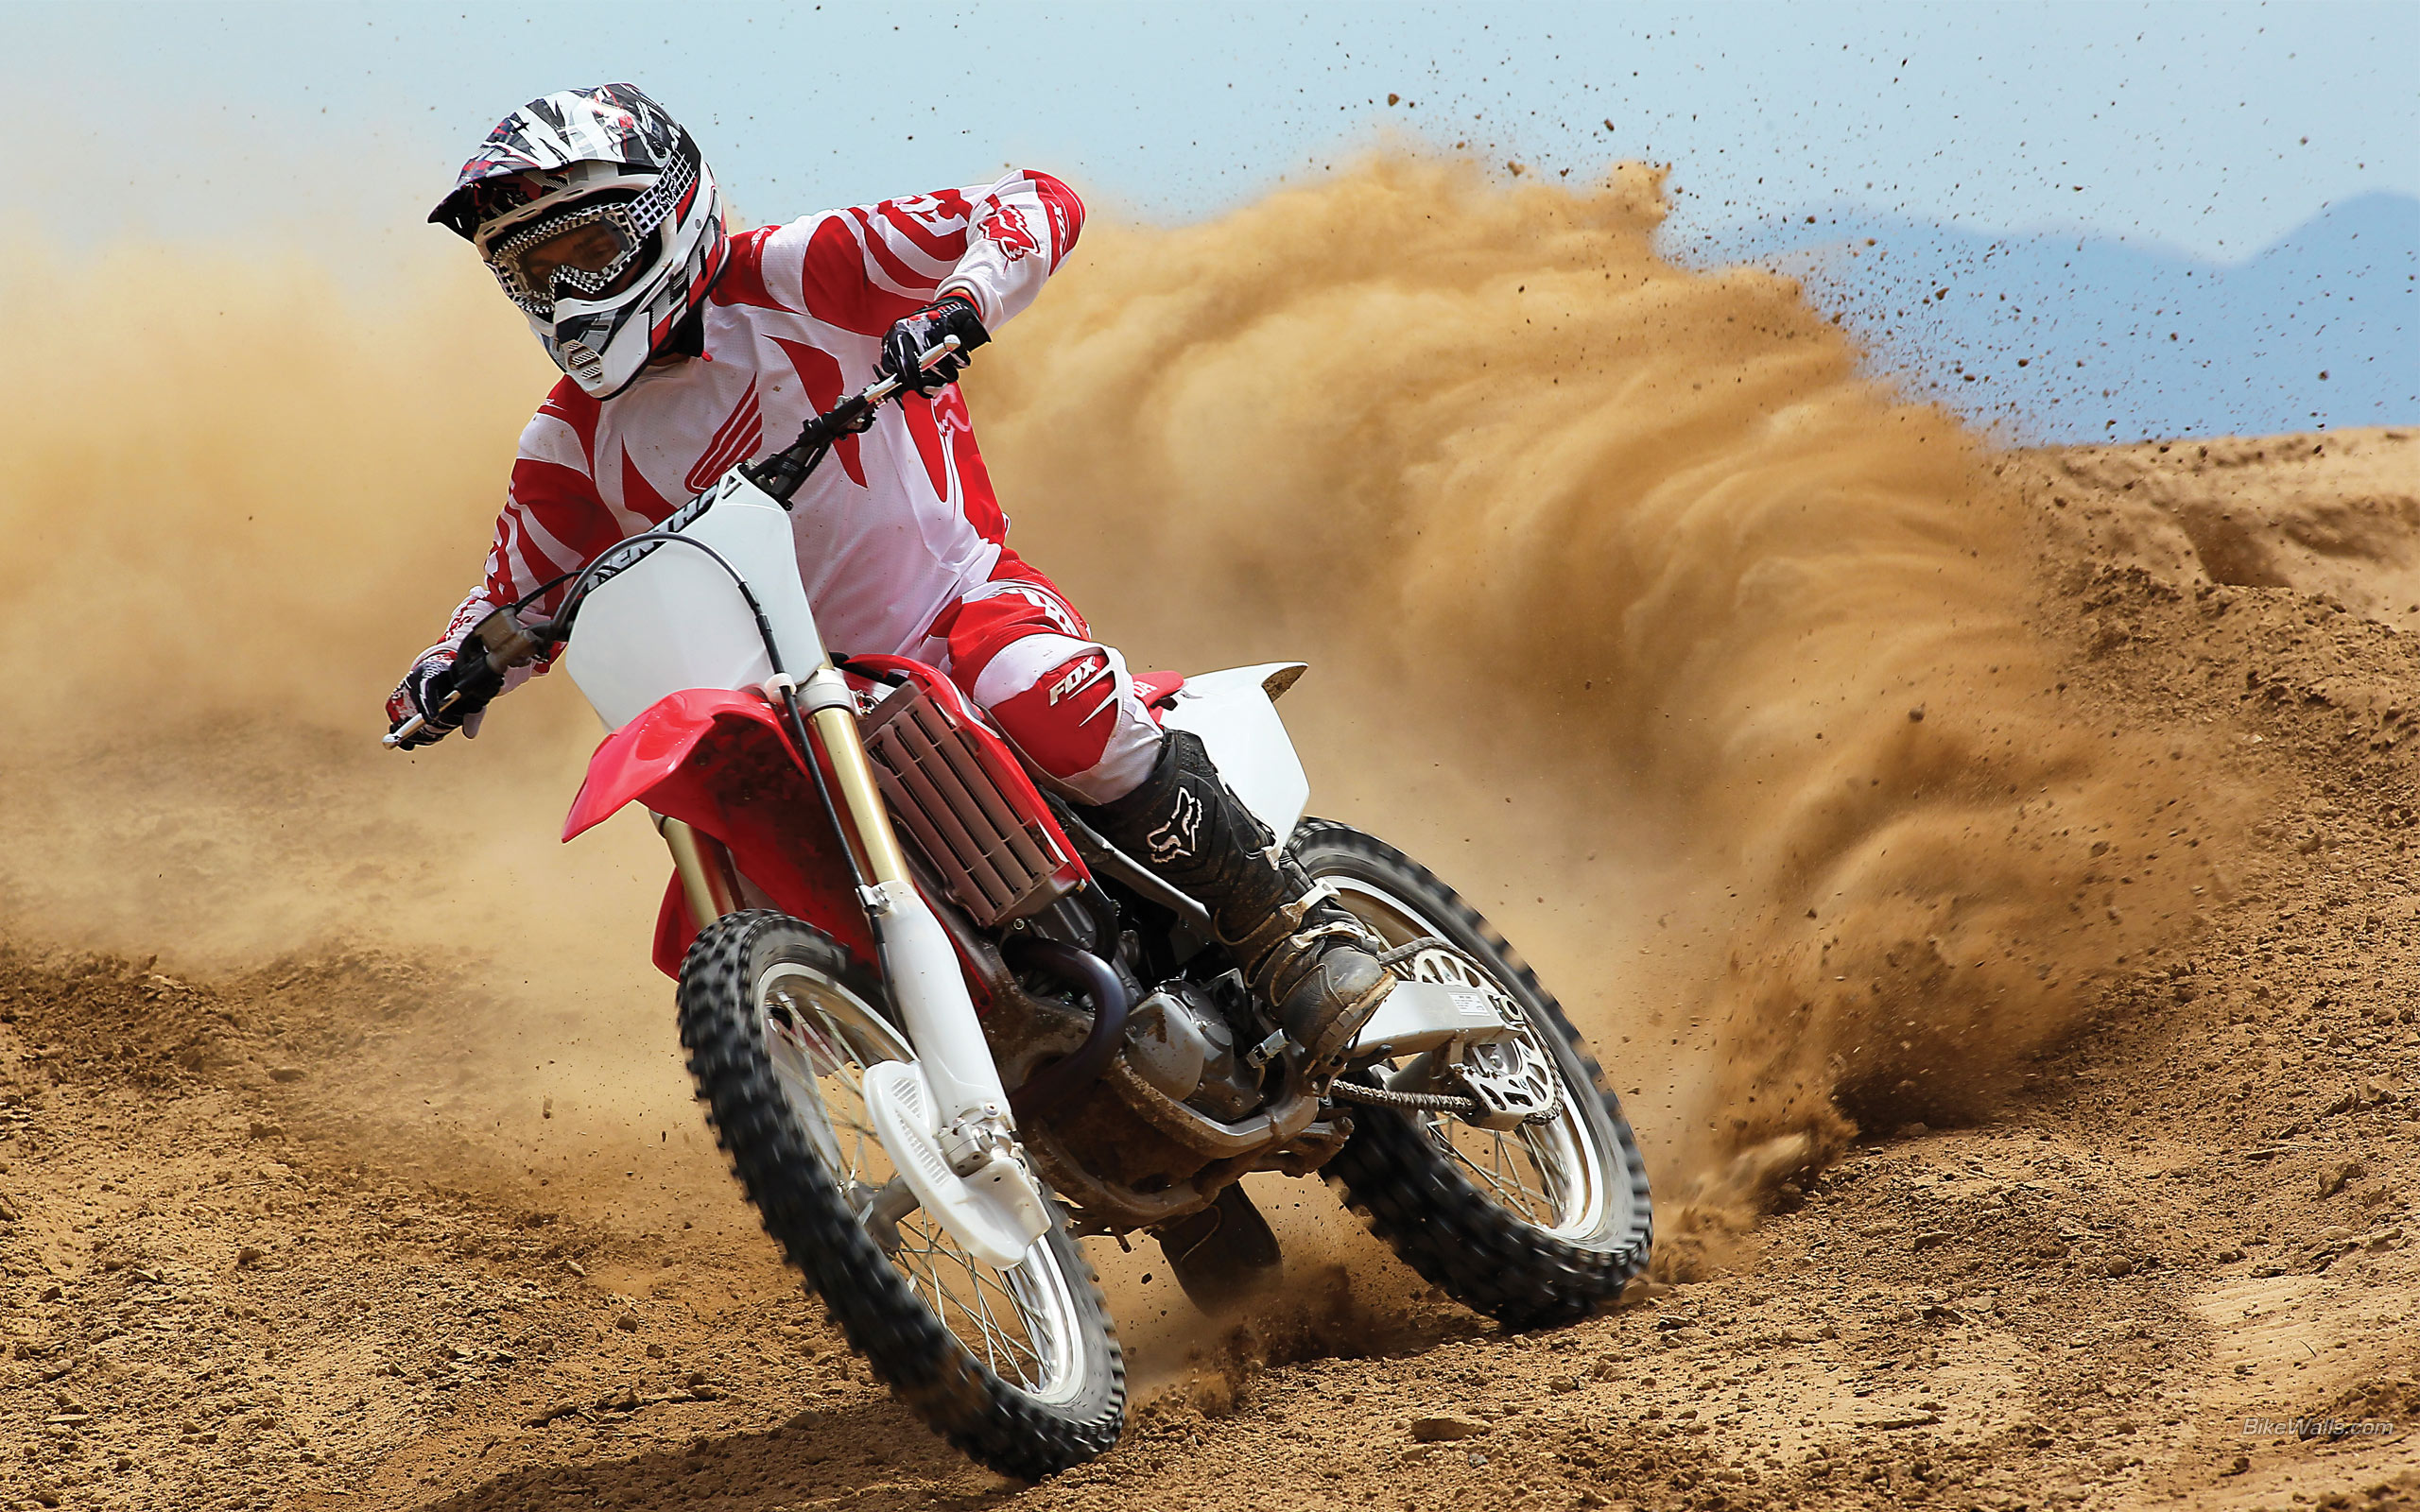 Honda Motocross CRF450 R   Motorcycles Photo 31816510 2560x1600